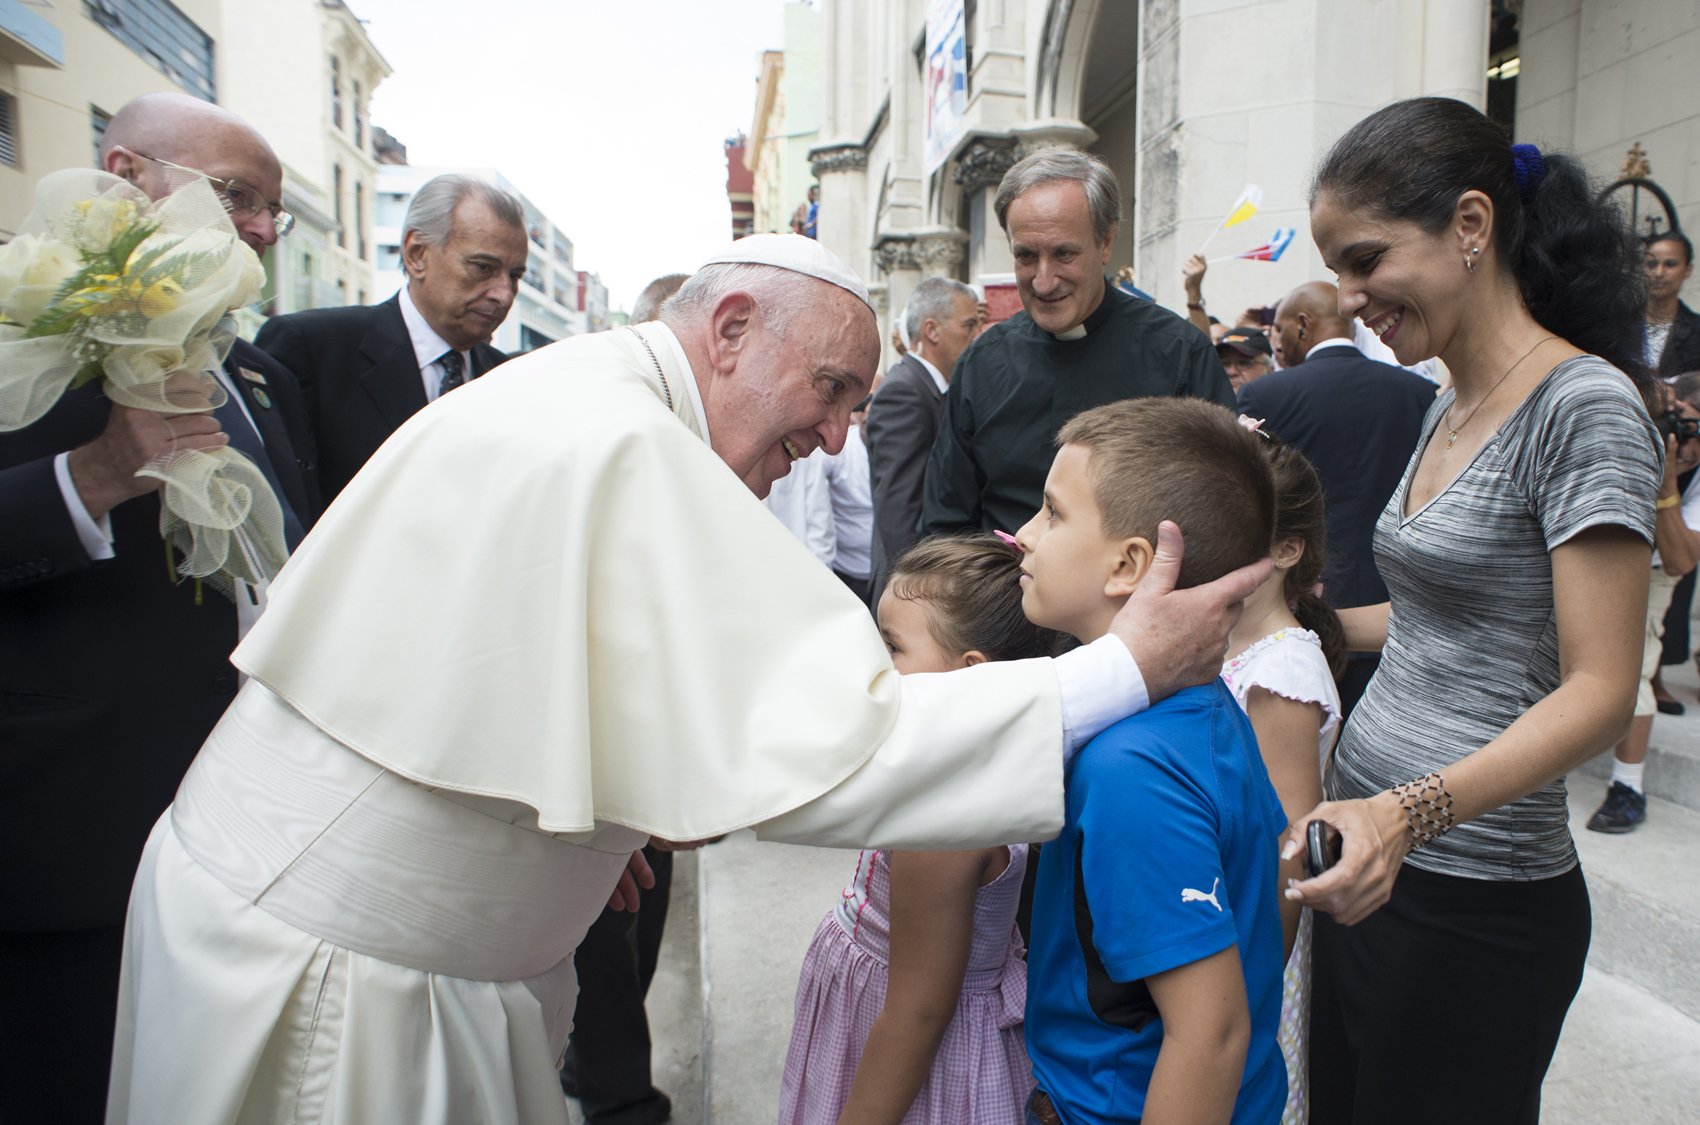 Pope Francis arrives at Havana's Jesuit-run parish of the Sacred Heart of Jesus and St. Ignatius of Loyola